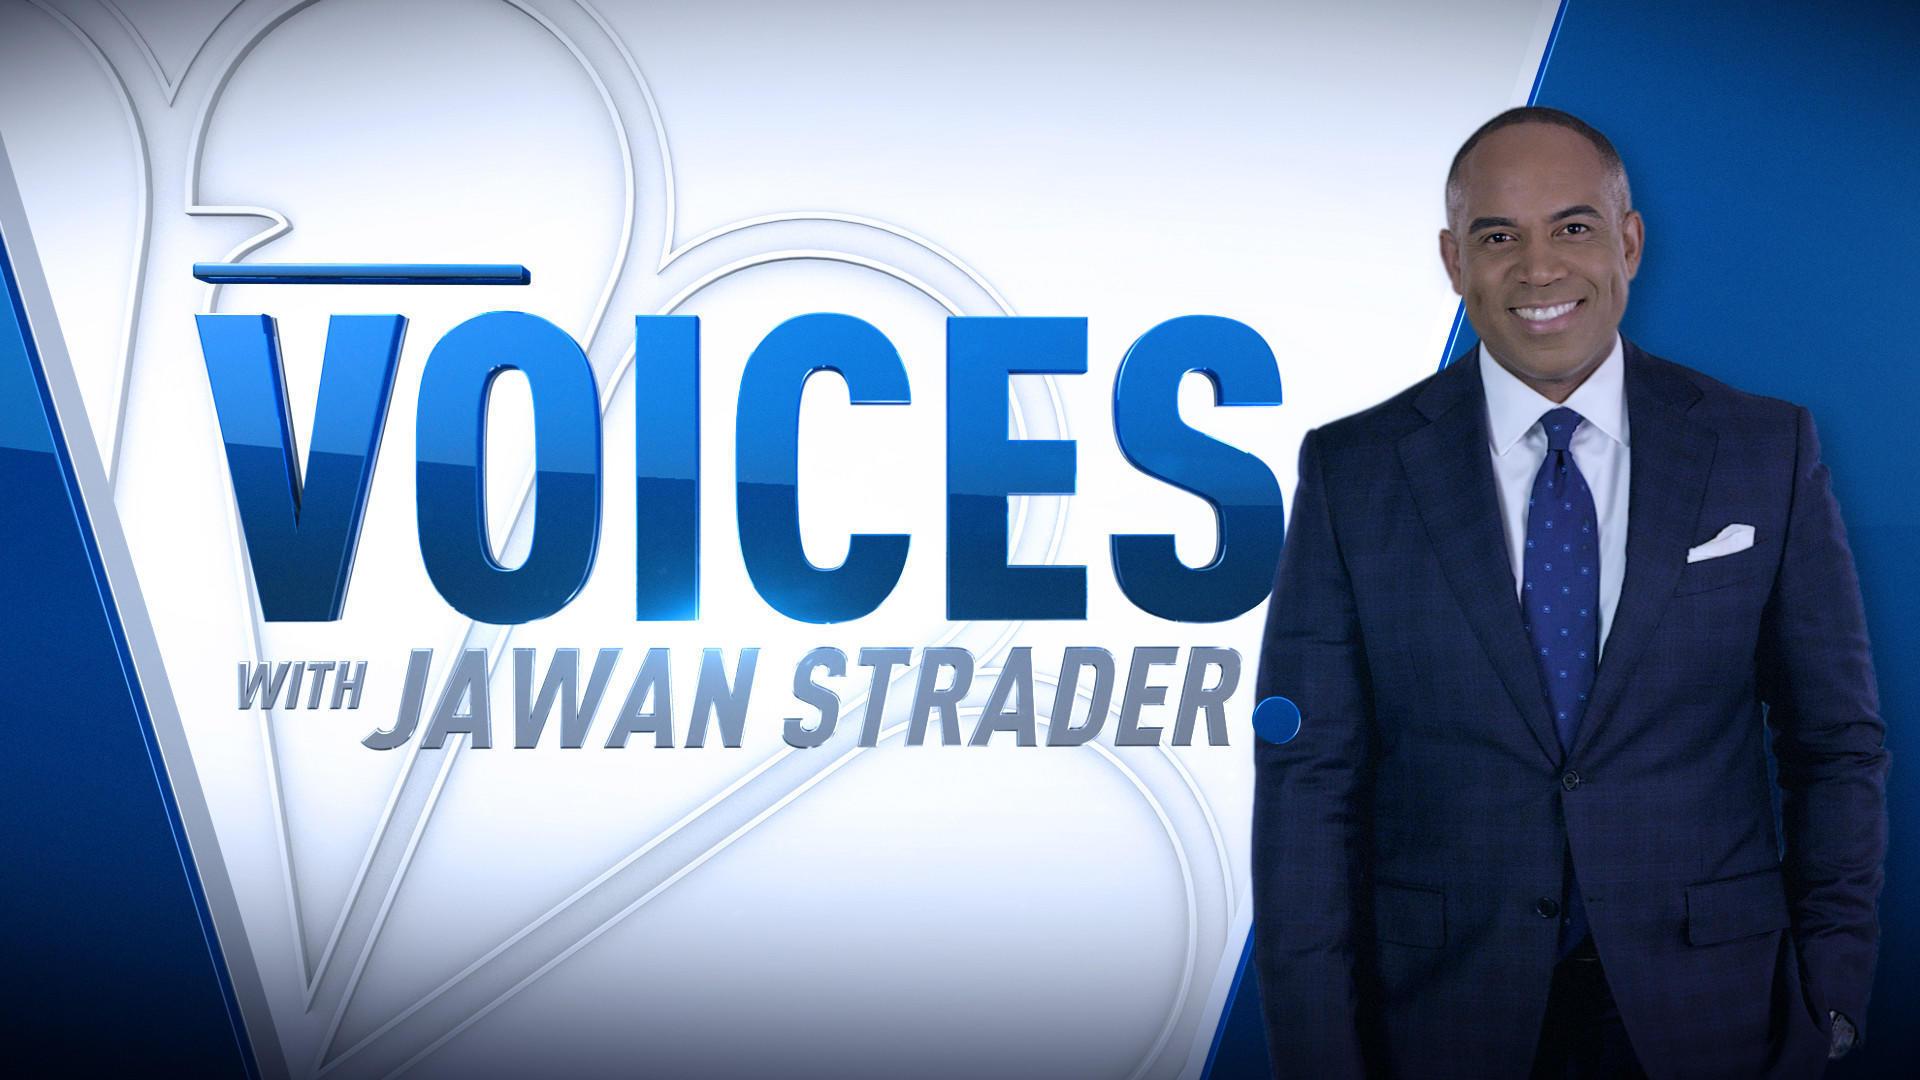 fl-fea-nbc6-voices-jawan-strader-show-20180202.jpg